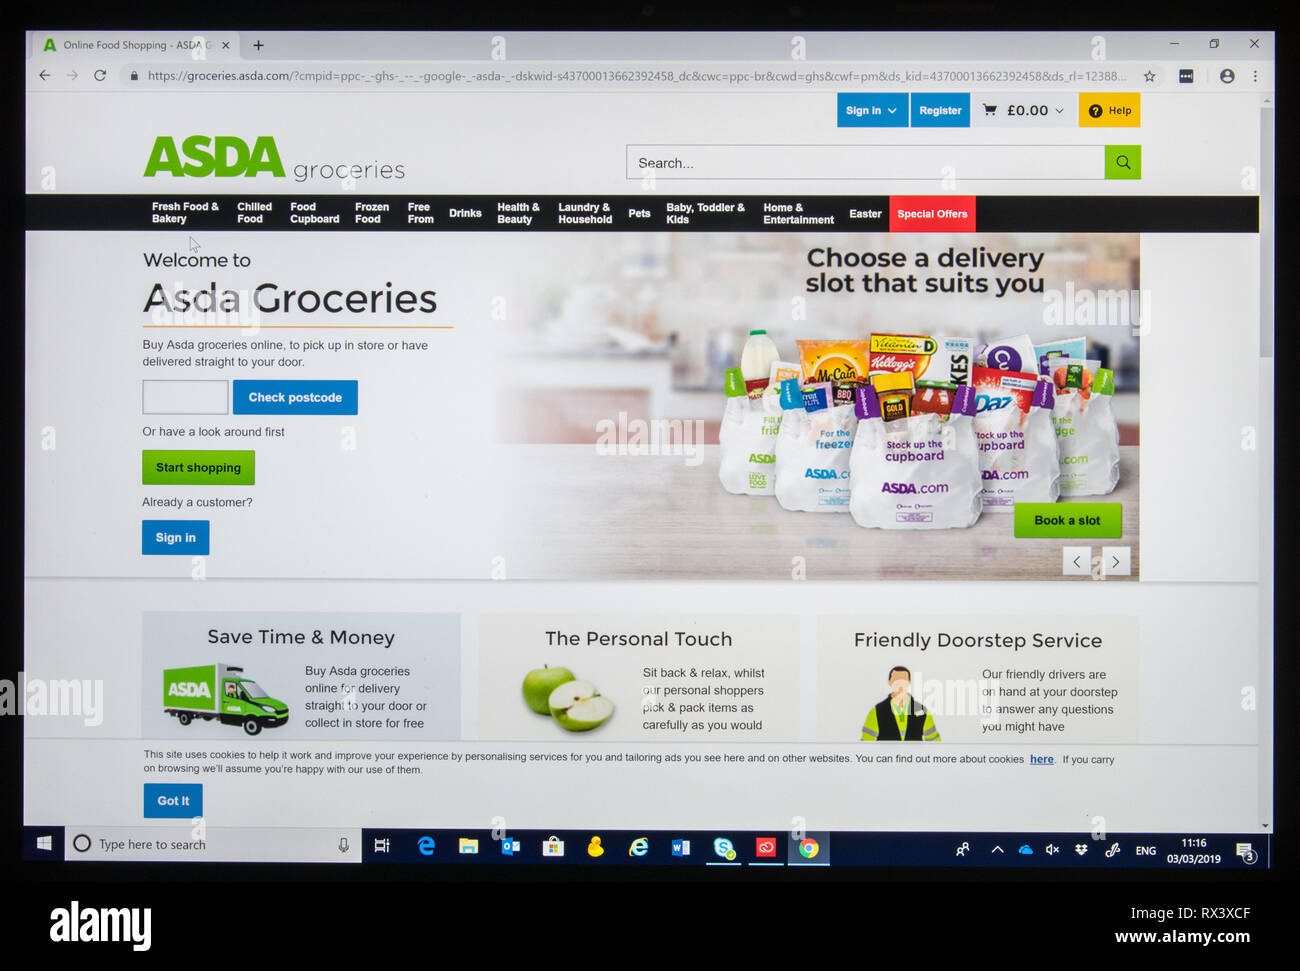 Asda Groceries online shop screen shot. - Stock Image